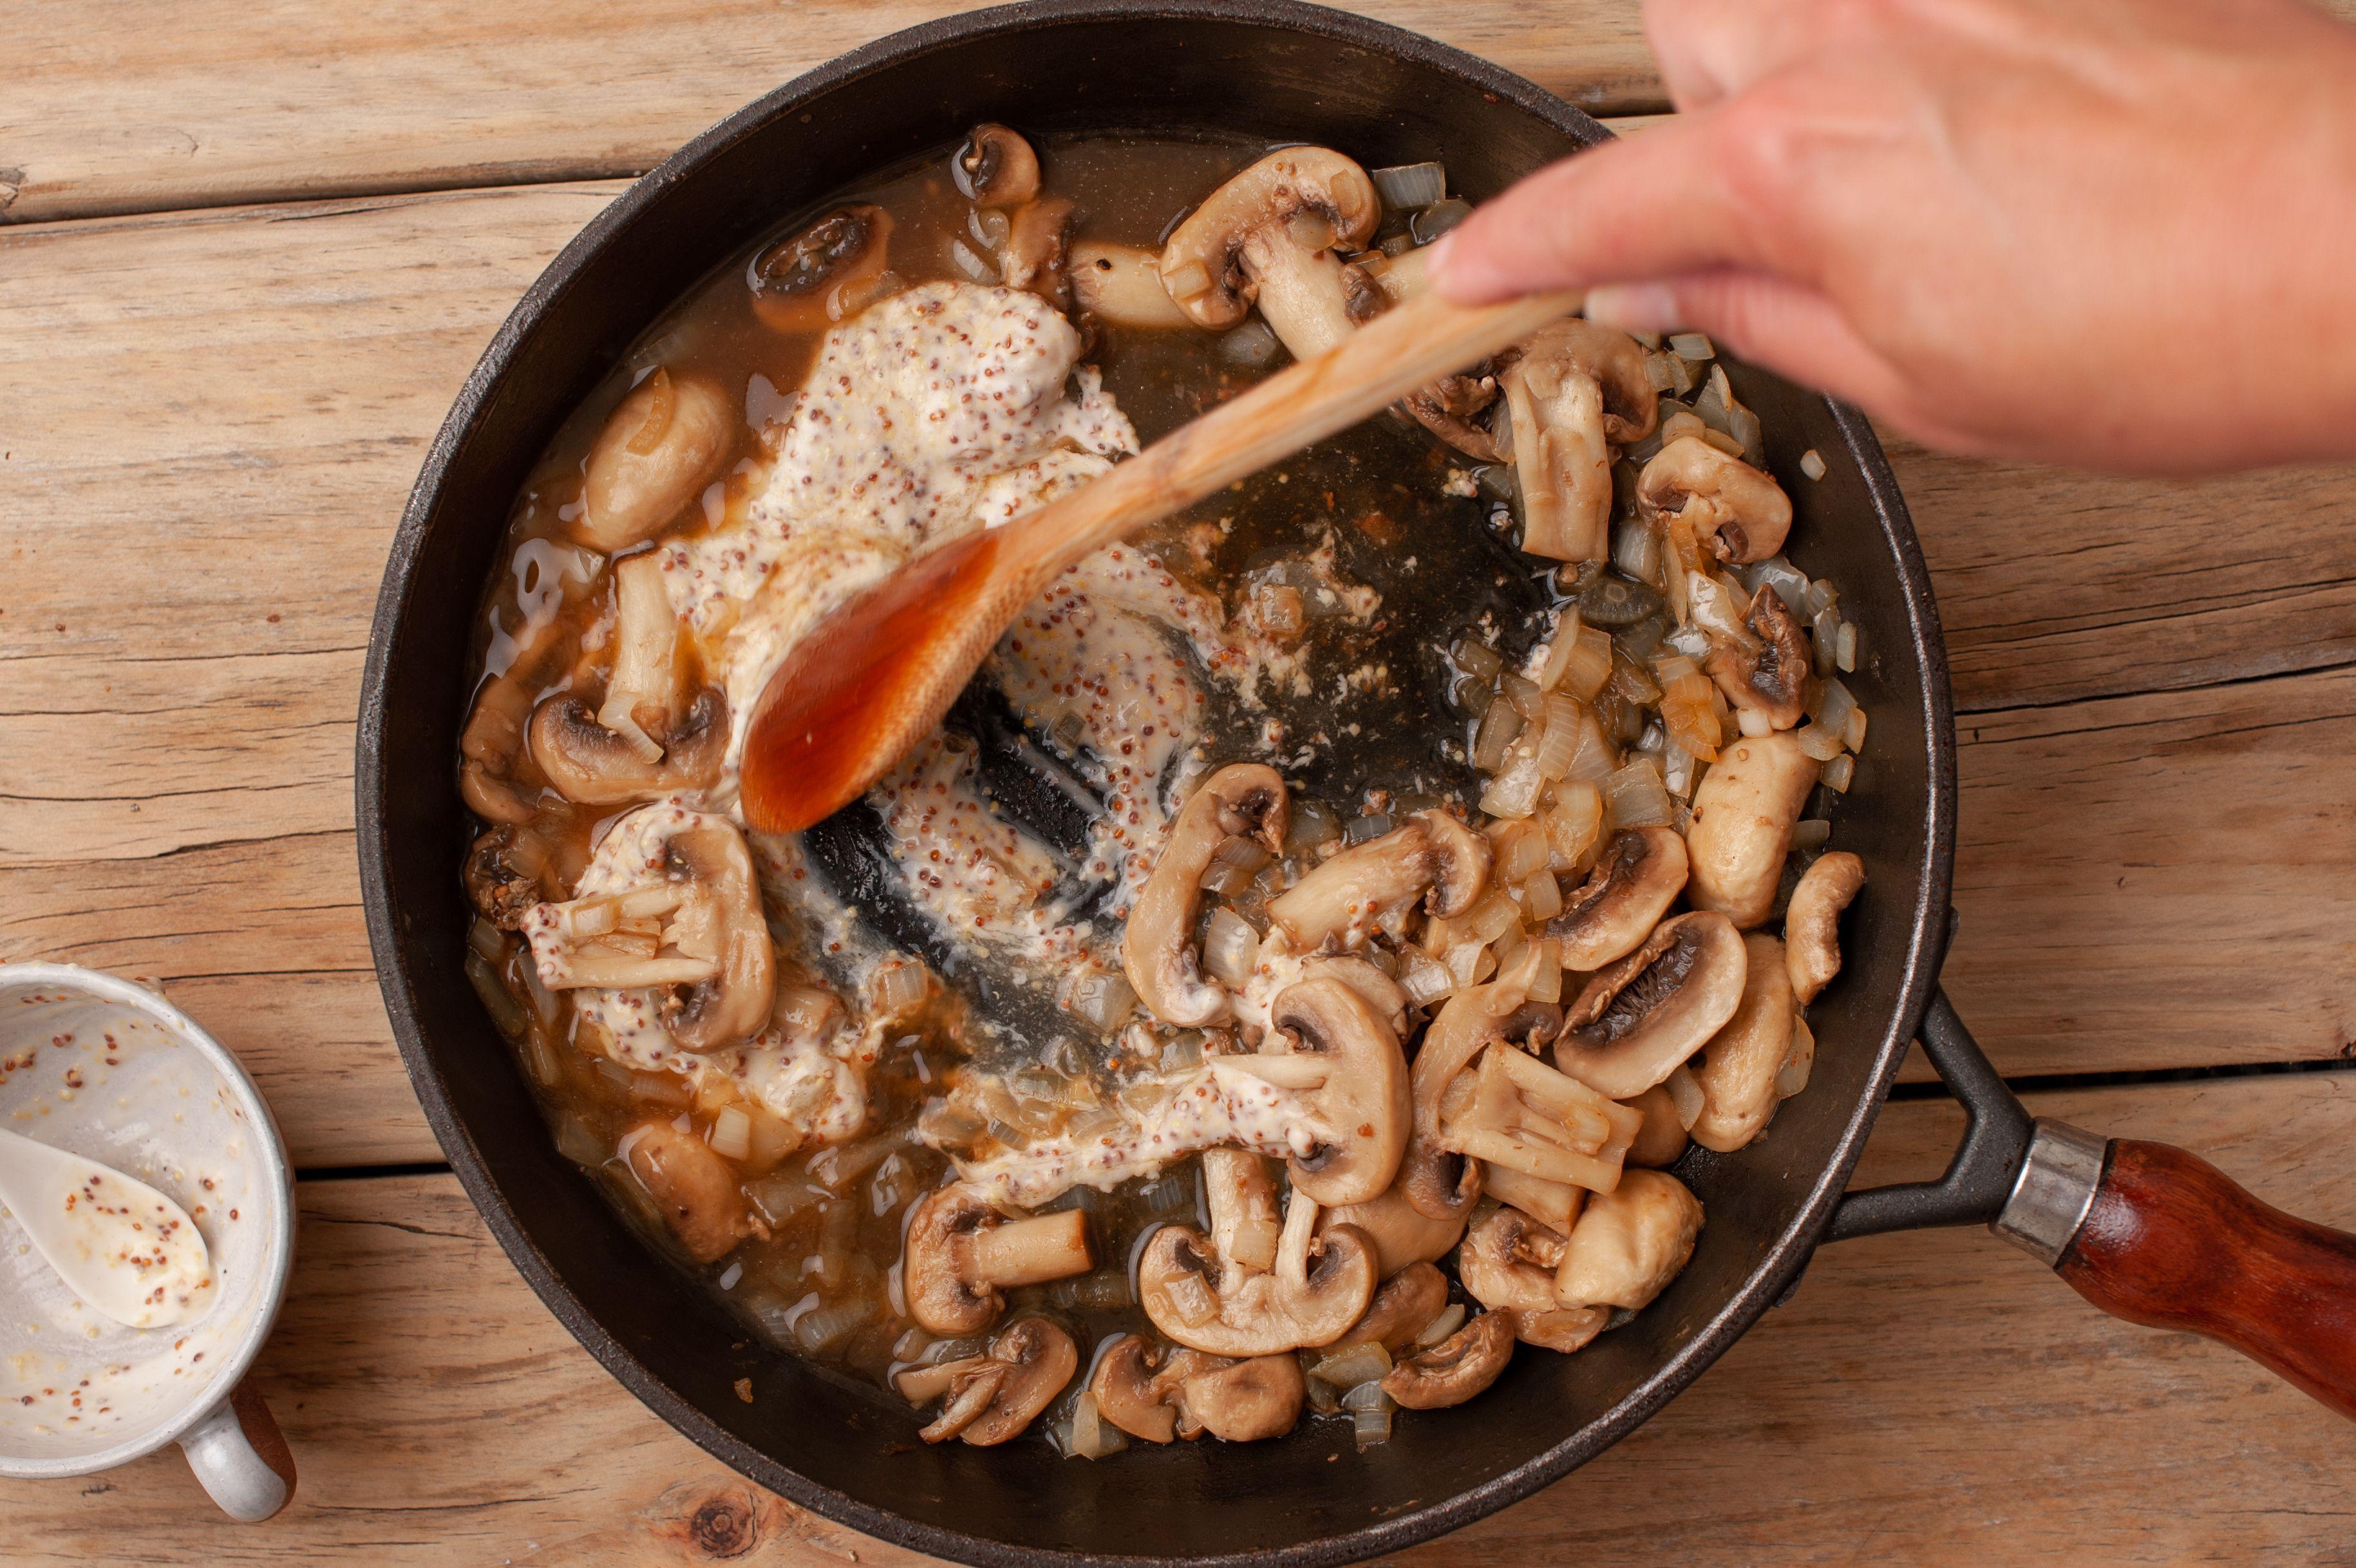 Stir broth into skillet